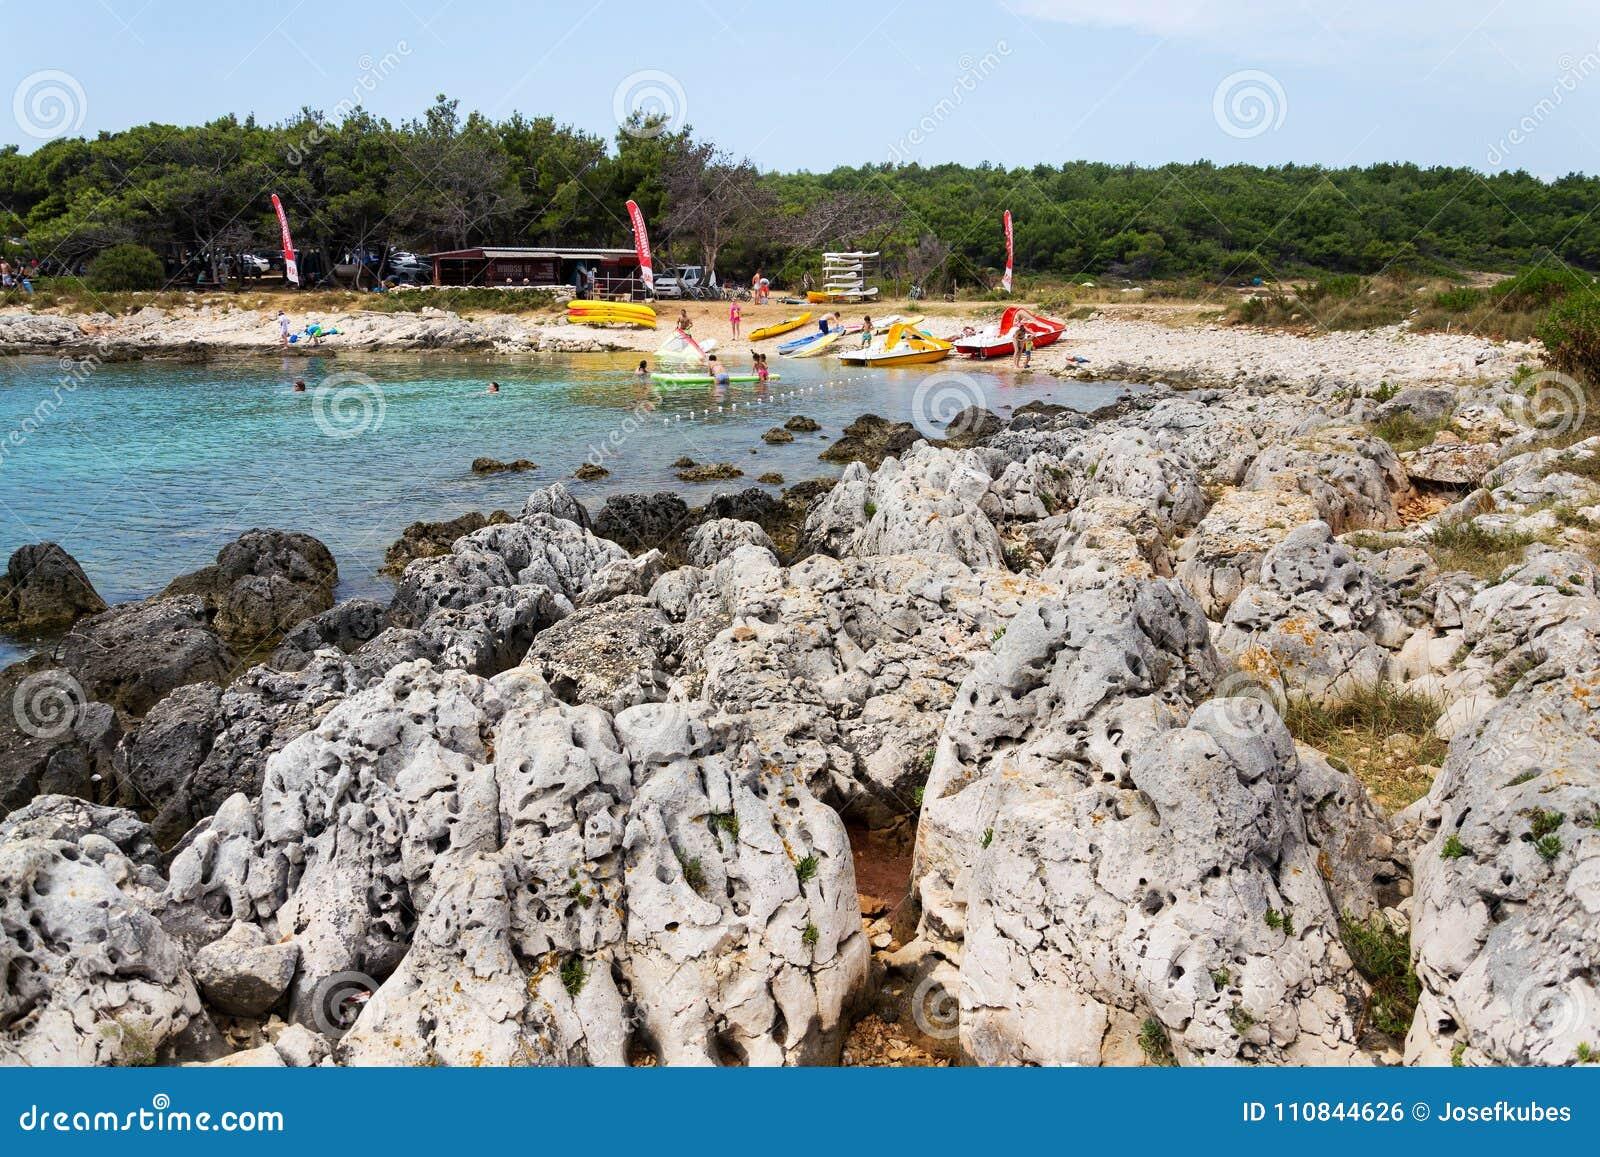 Tourists on Kamenjak peninsula beach by the Adriatic Sea in Premantura, Croatia